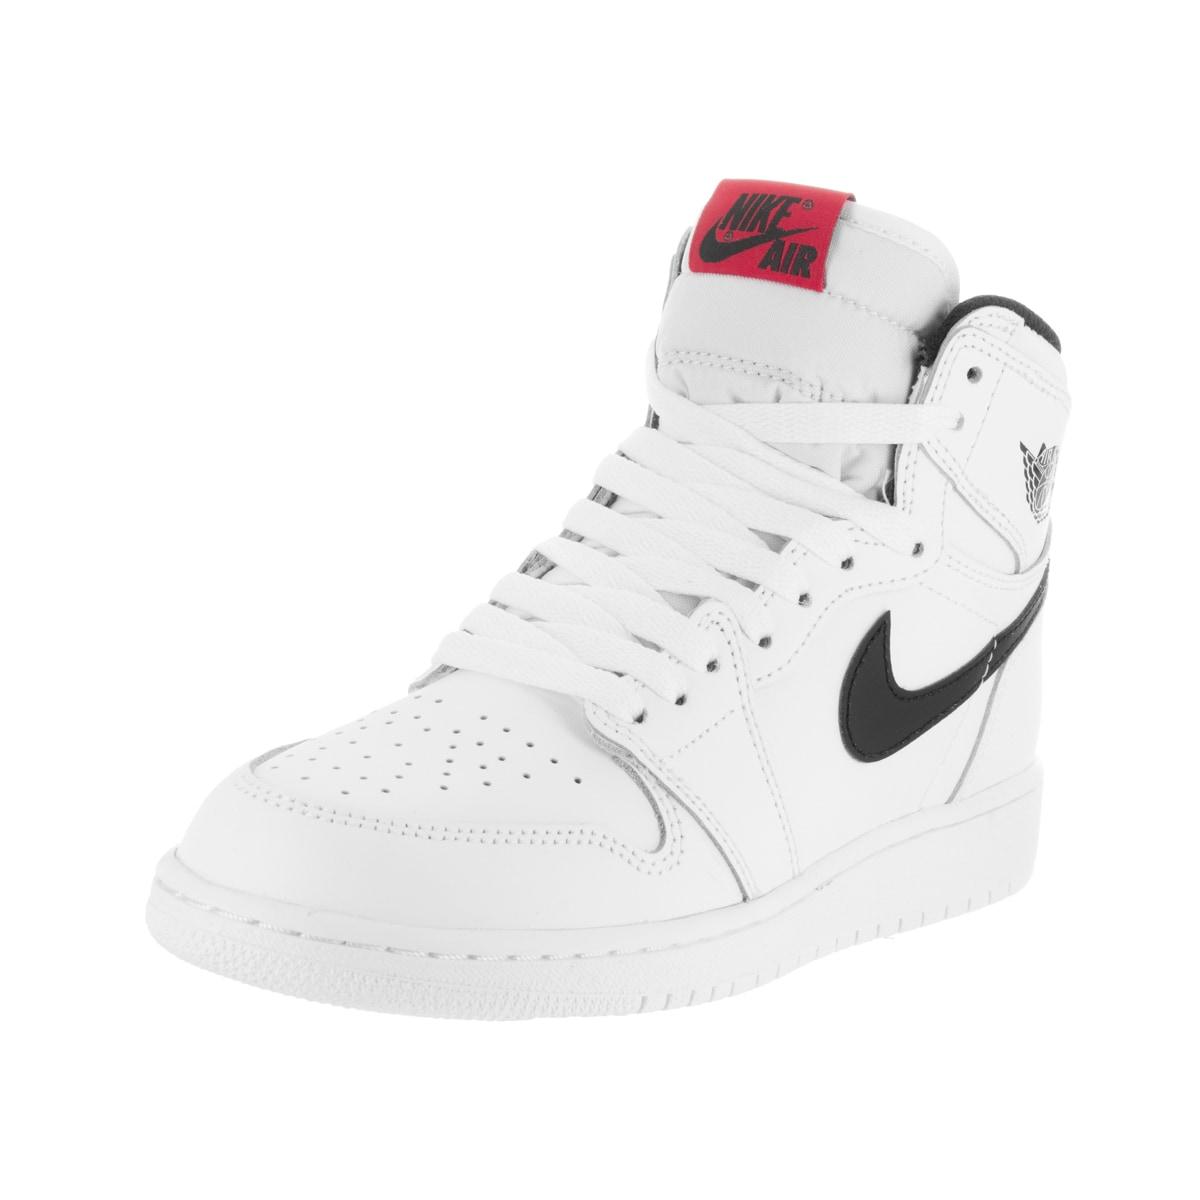 Nike Kids Air Jordan 1 Retro High OG Bg Basketball Shoe